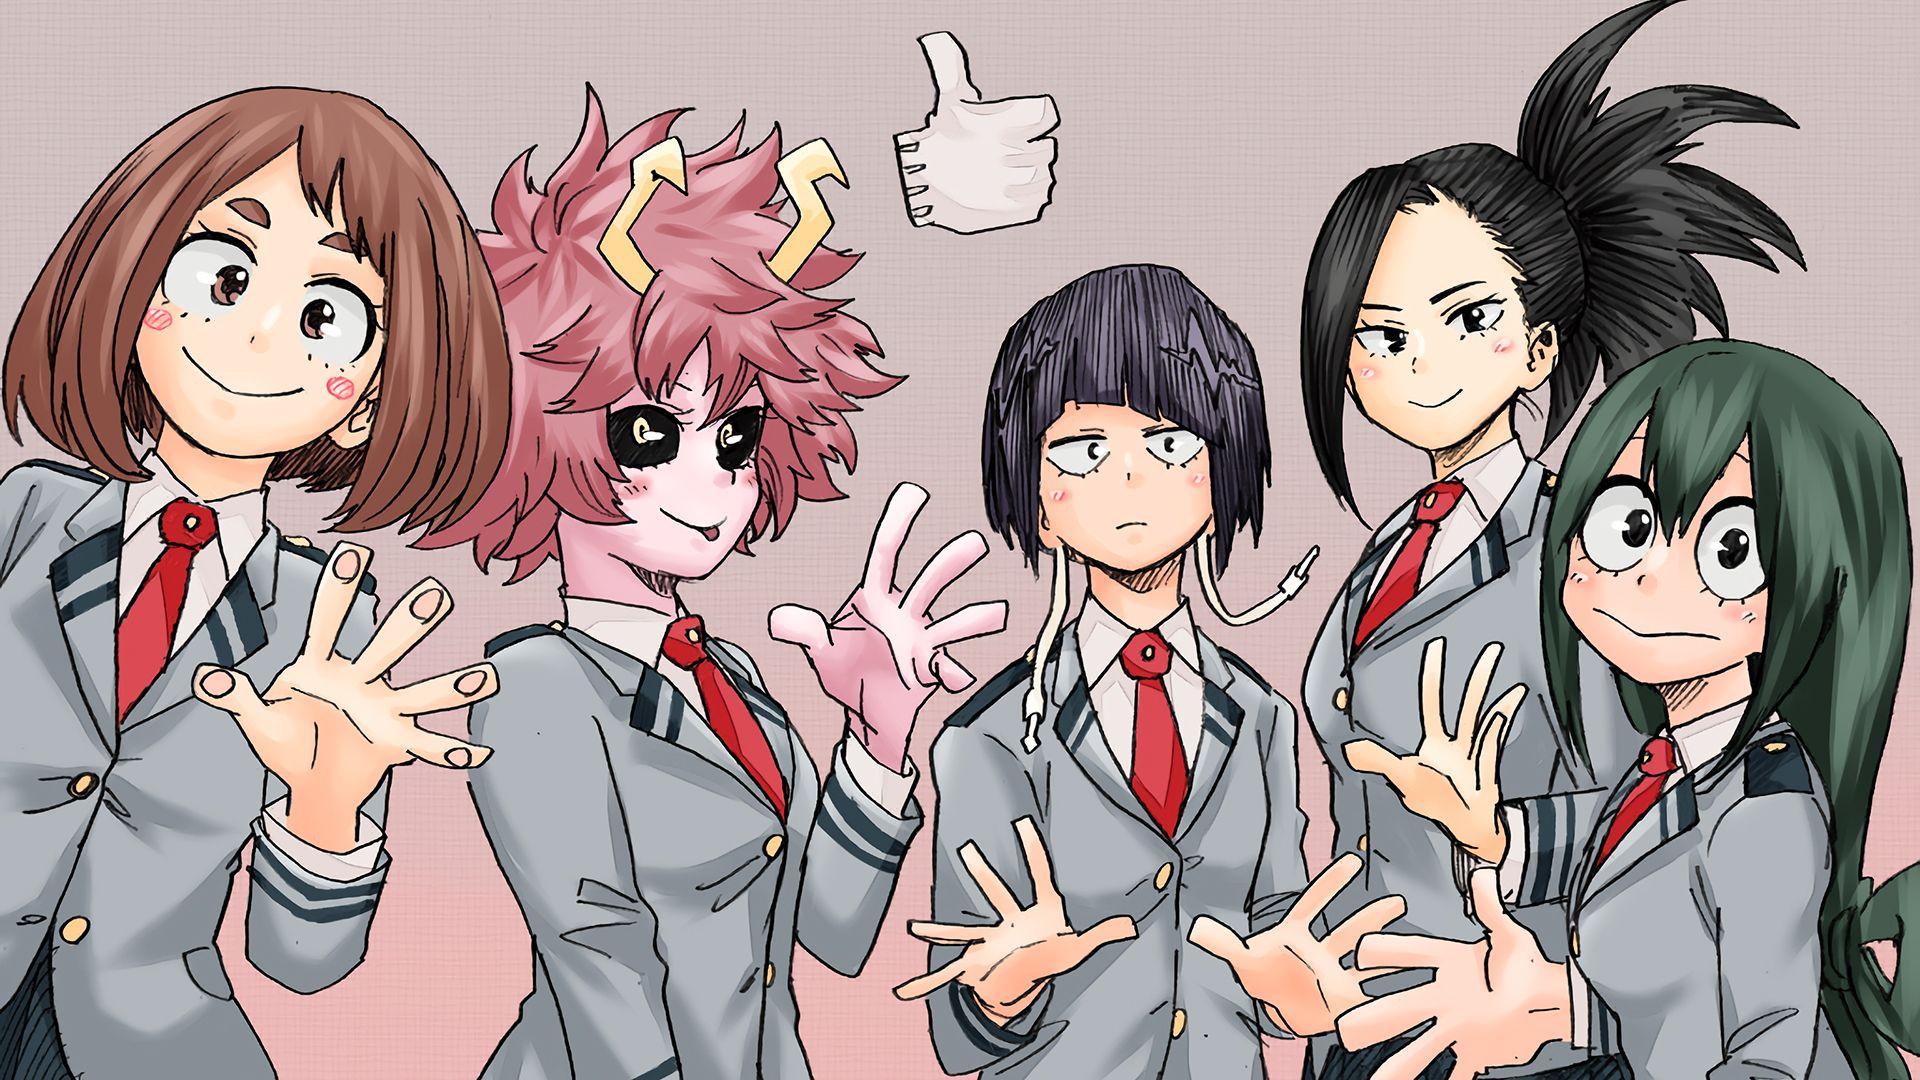 My Anime Hero Academy Uraraka